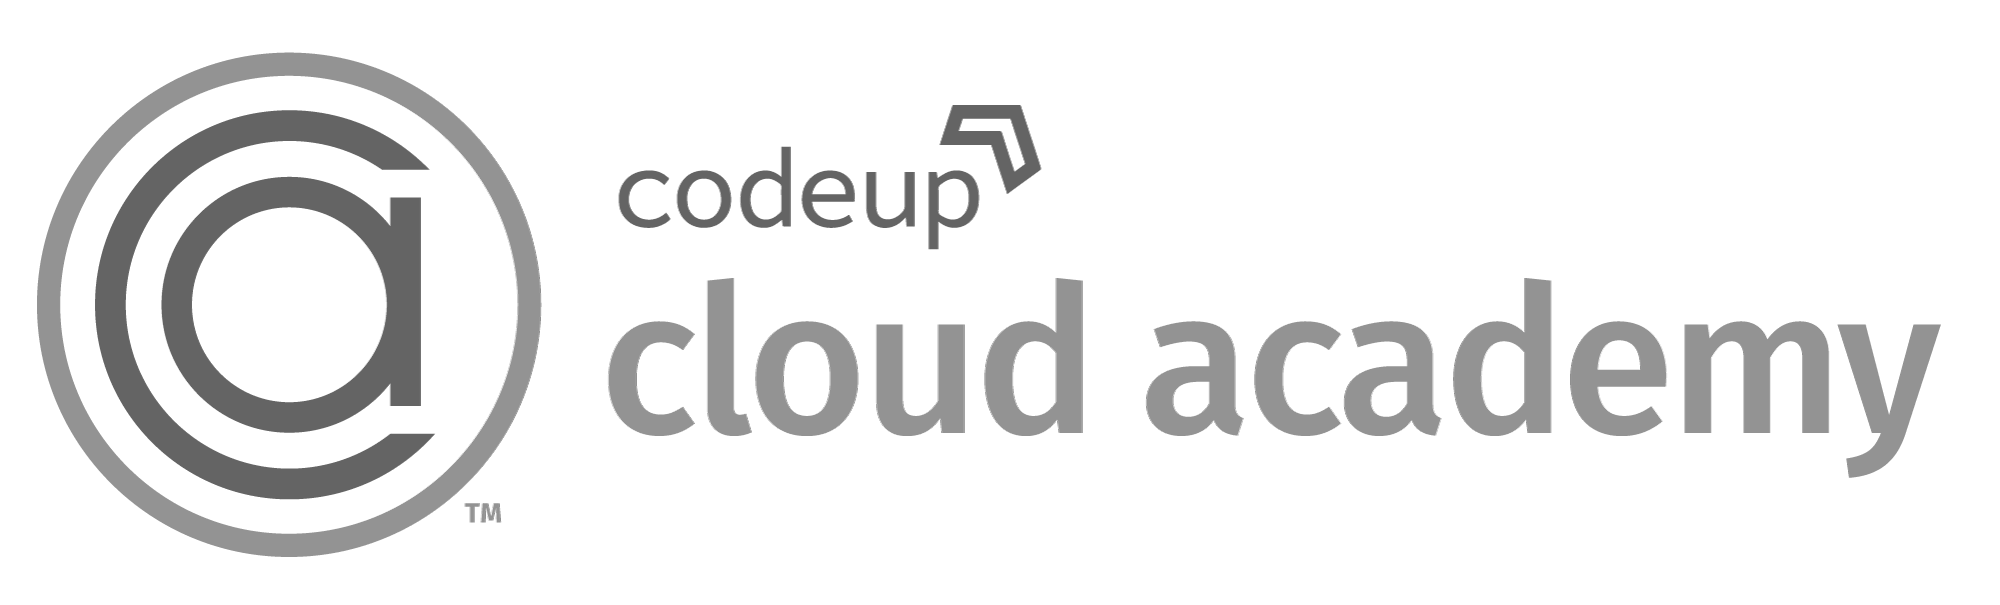 Codeup Cloud Academy